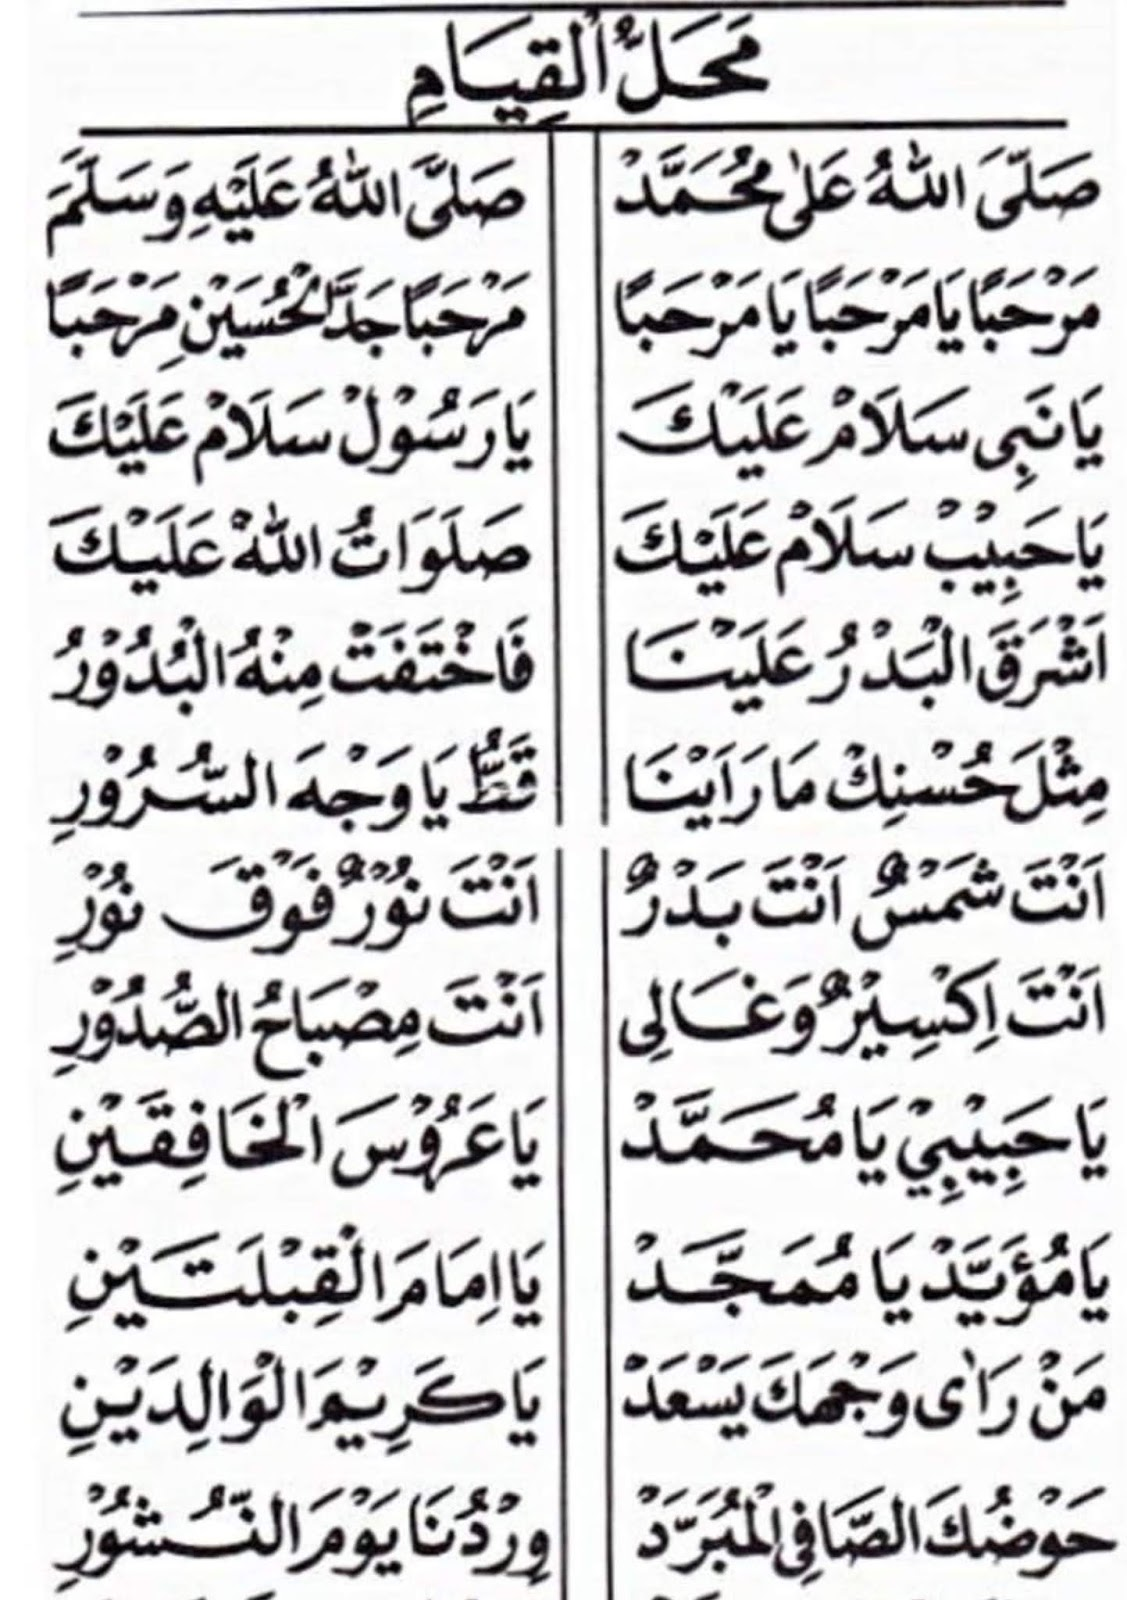 Mahalul Qiyam Maulid Simthudduror Teks Lirik + Arti Lengkap